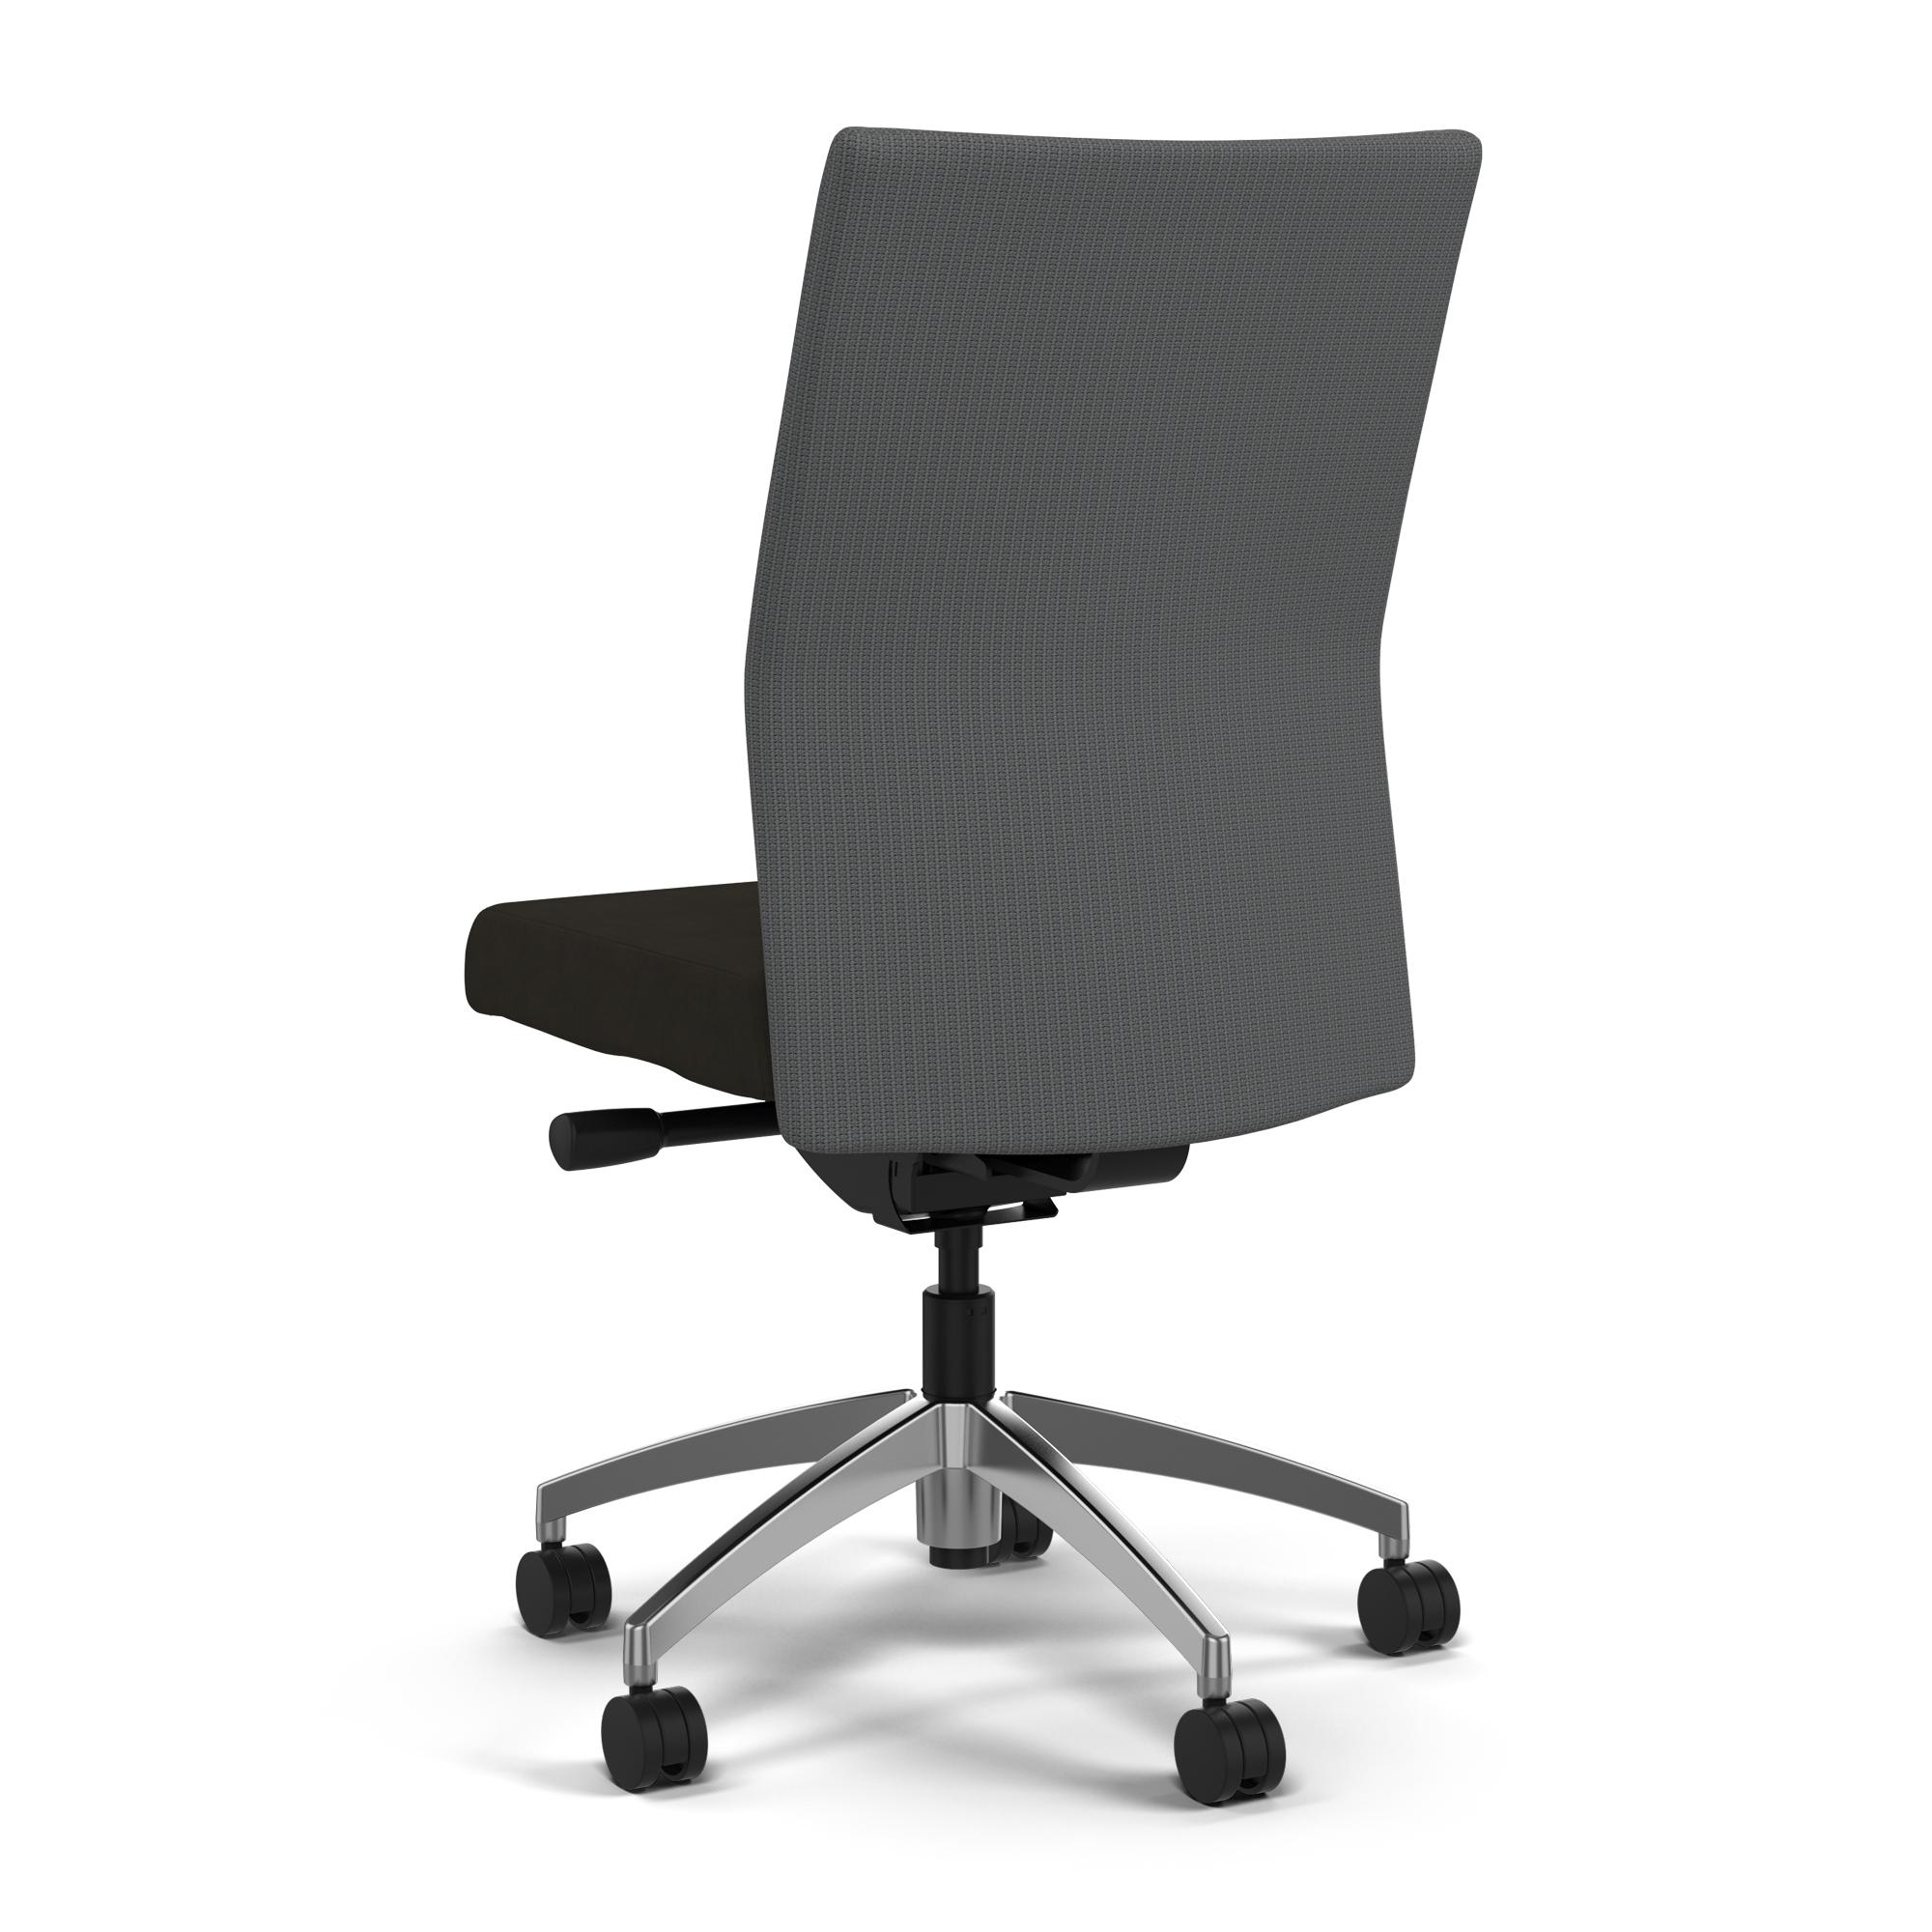 sona_knitback_chair_armless_onyx_3qback_gallery.jpg